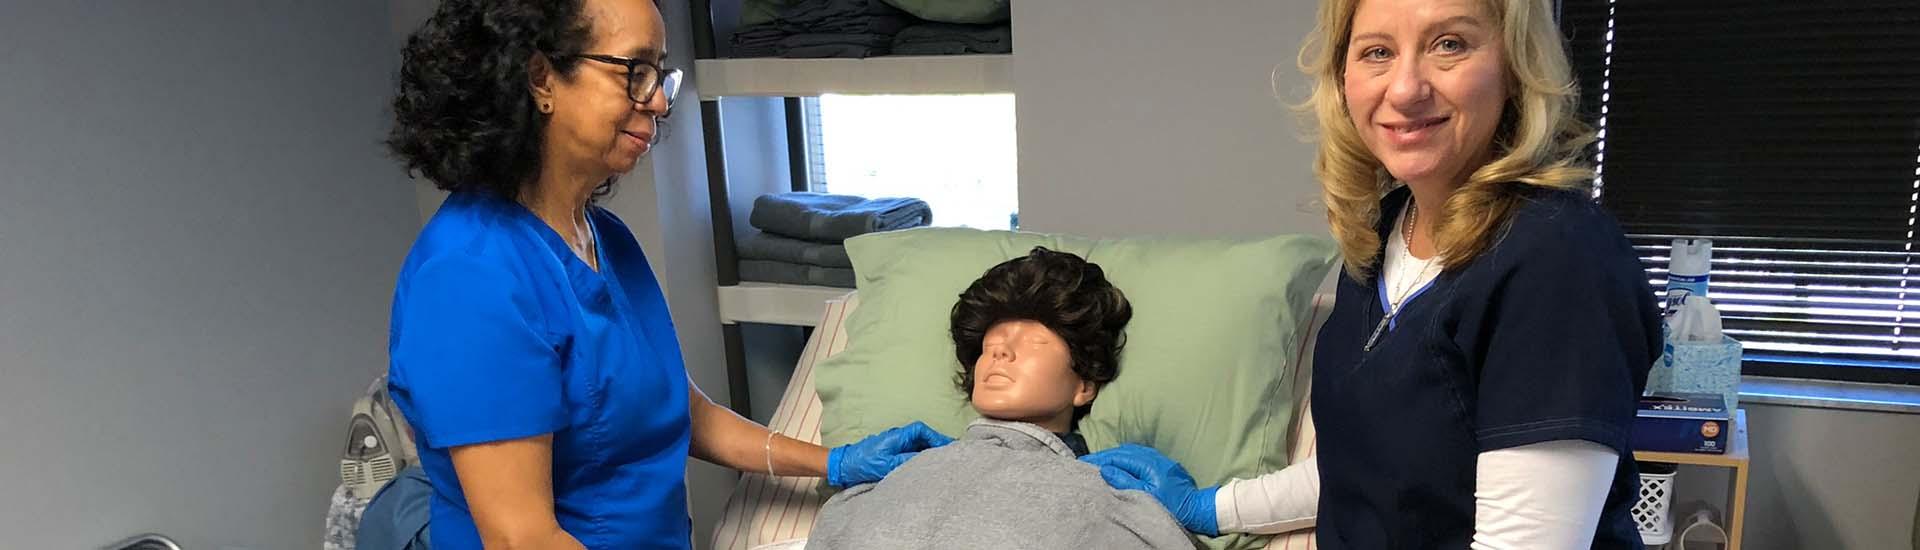 Bayshore Home Health Aide Training Lab